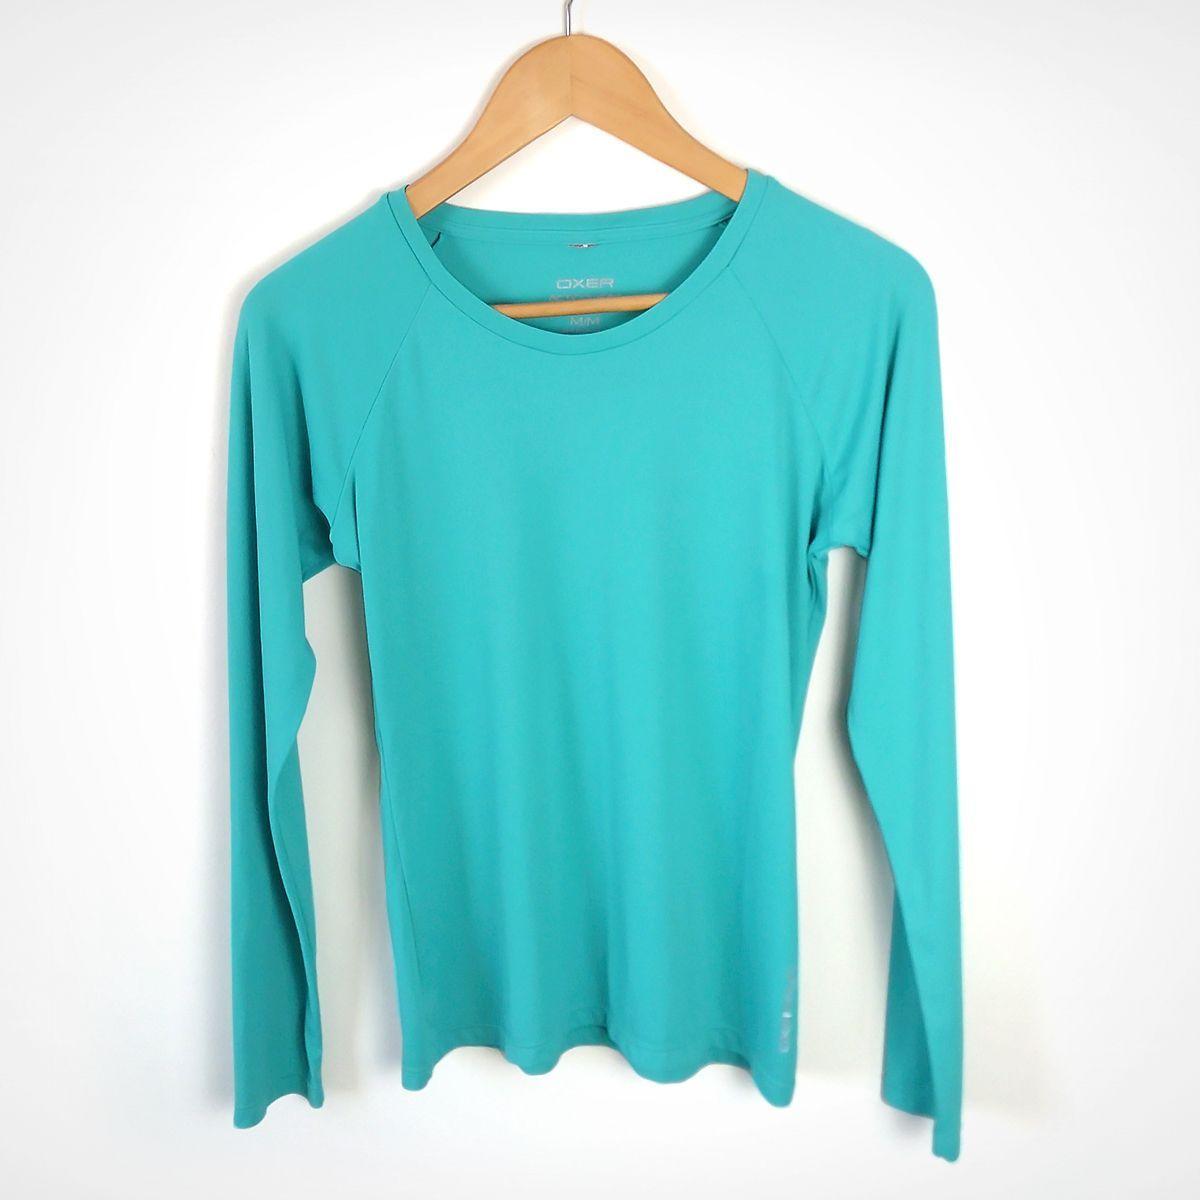 blusa eportiva azul turquesa manga longa fitness caminhada corrida - blusas oxer